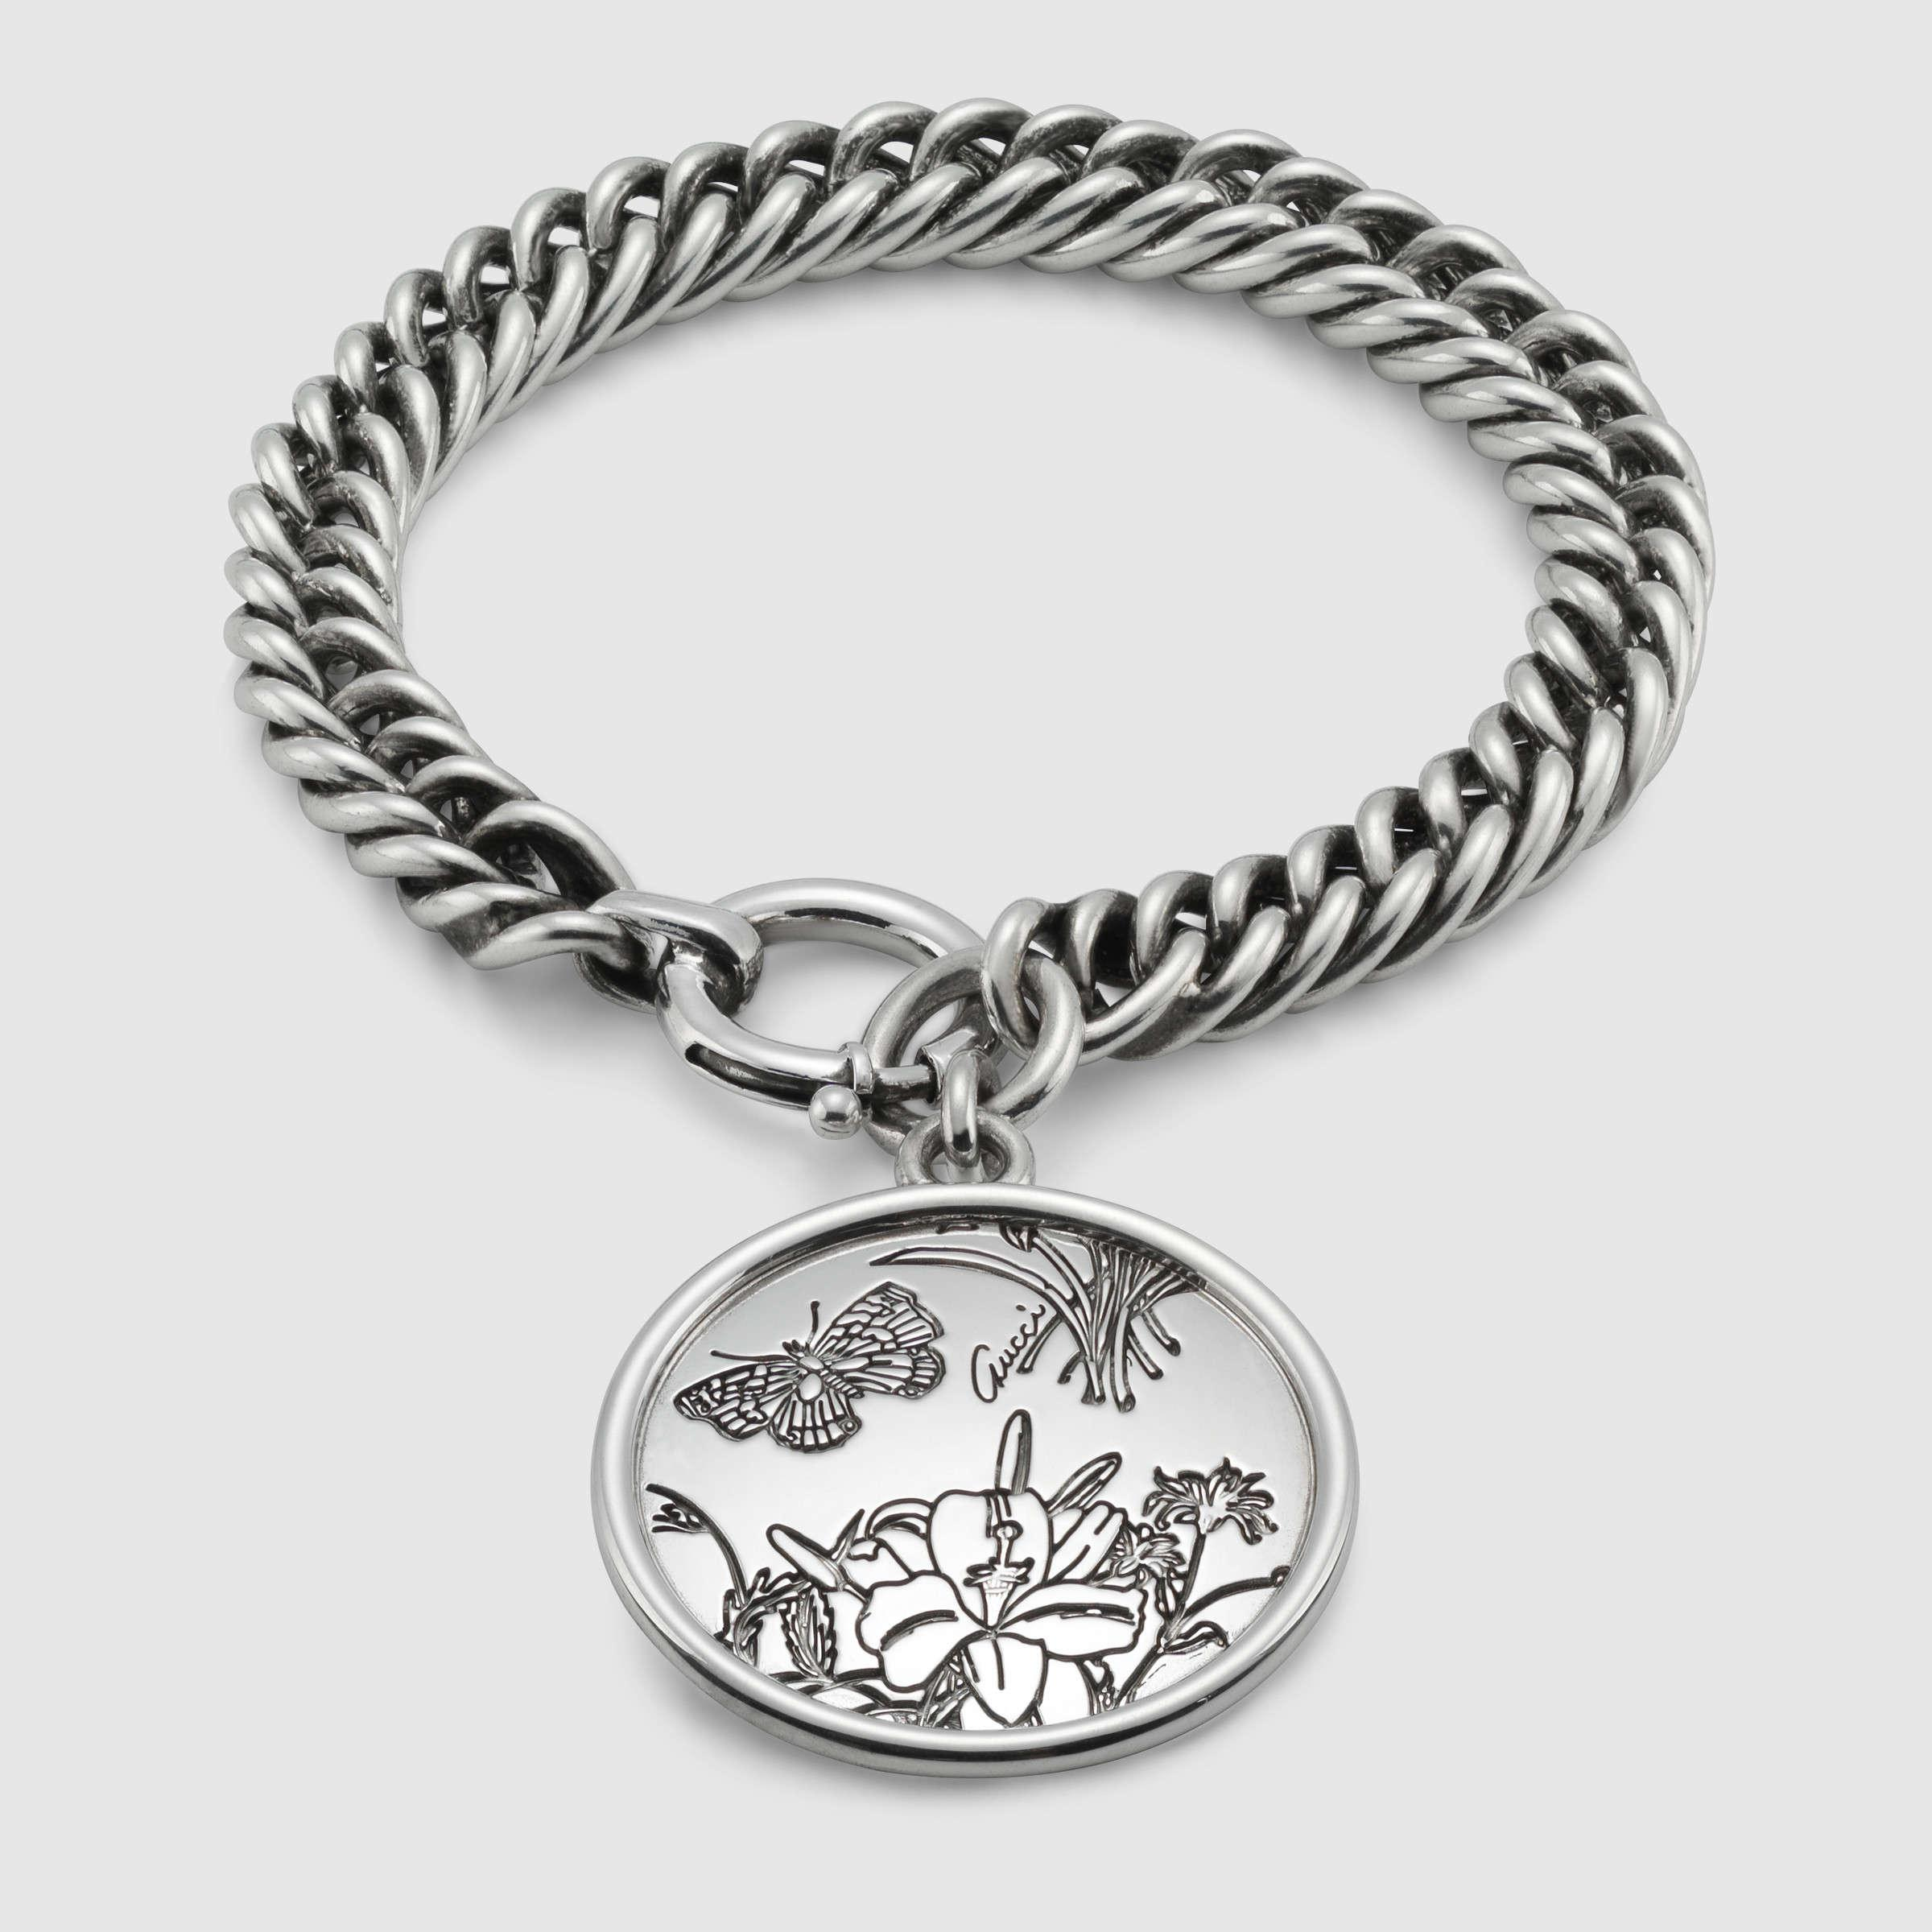 c17ae2b9e380b Gucci Metallic Flora Bracelet In Sterling Silver